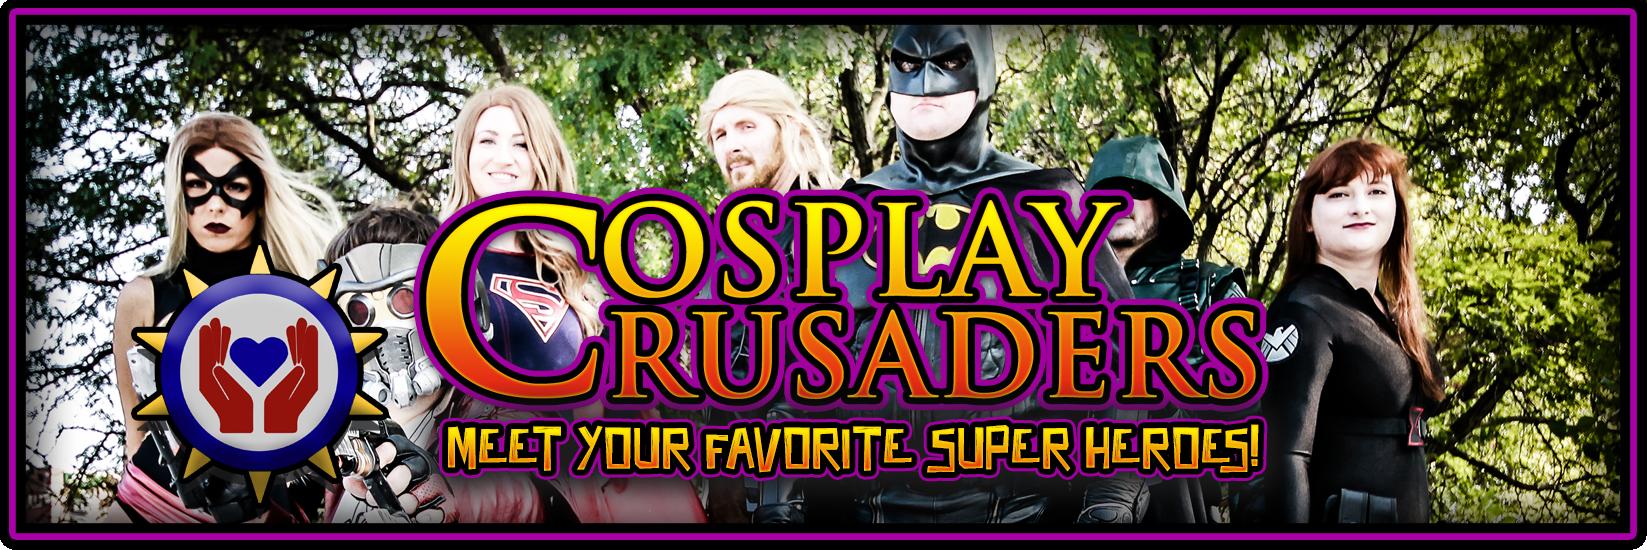 Cosplay-Crusaders-Banner.png